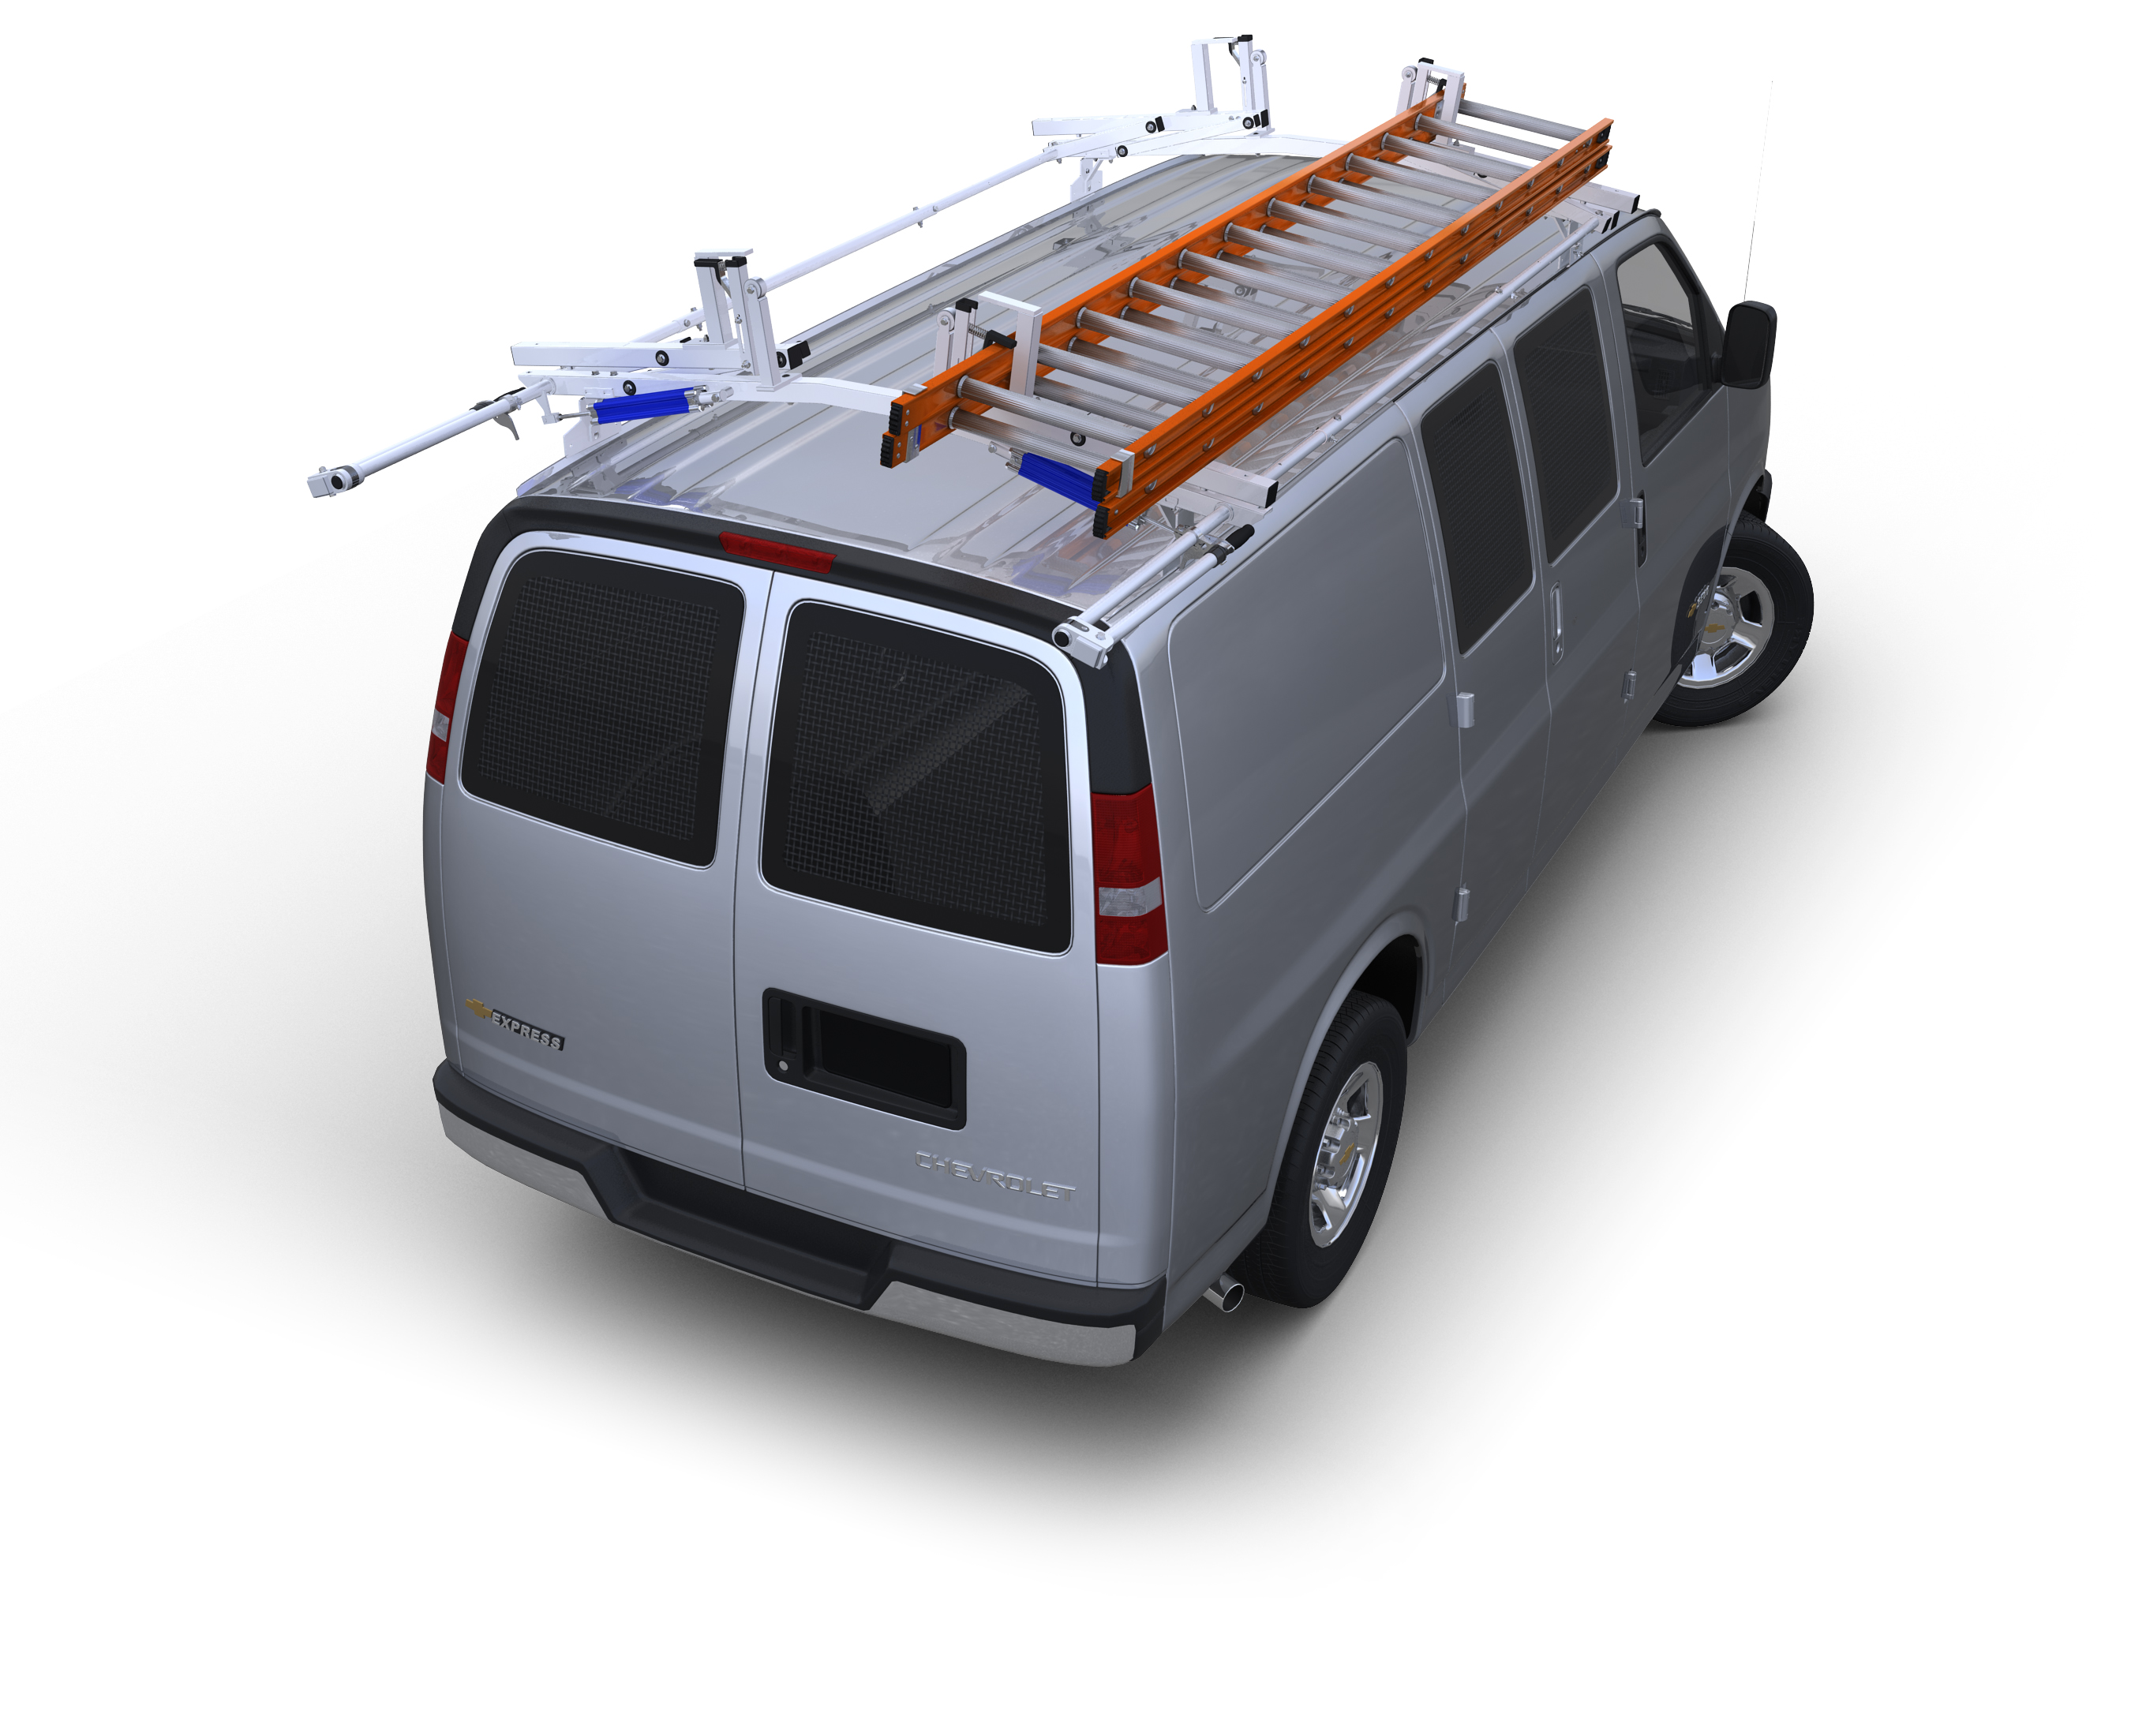 Versatile Storage Trays & Multipurpuse Open/Closed Door Tray - American Van